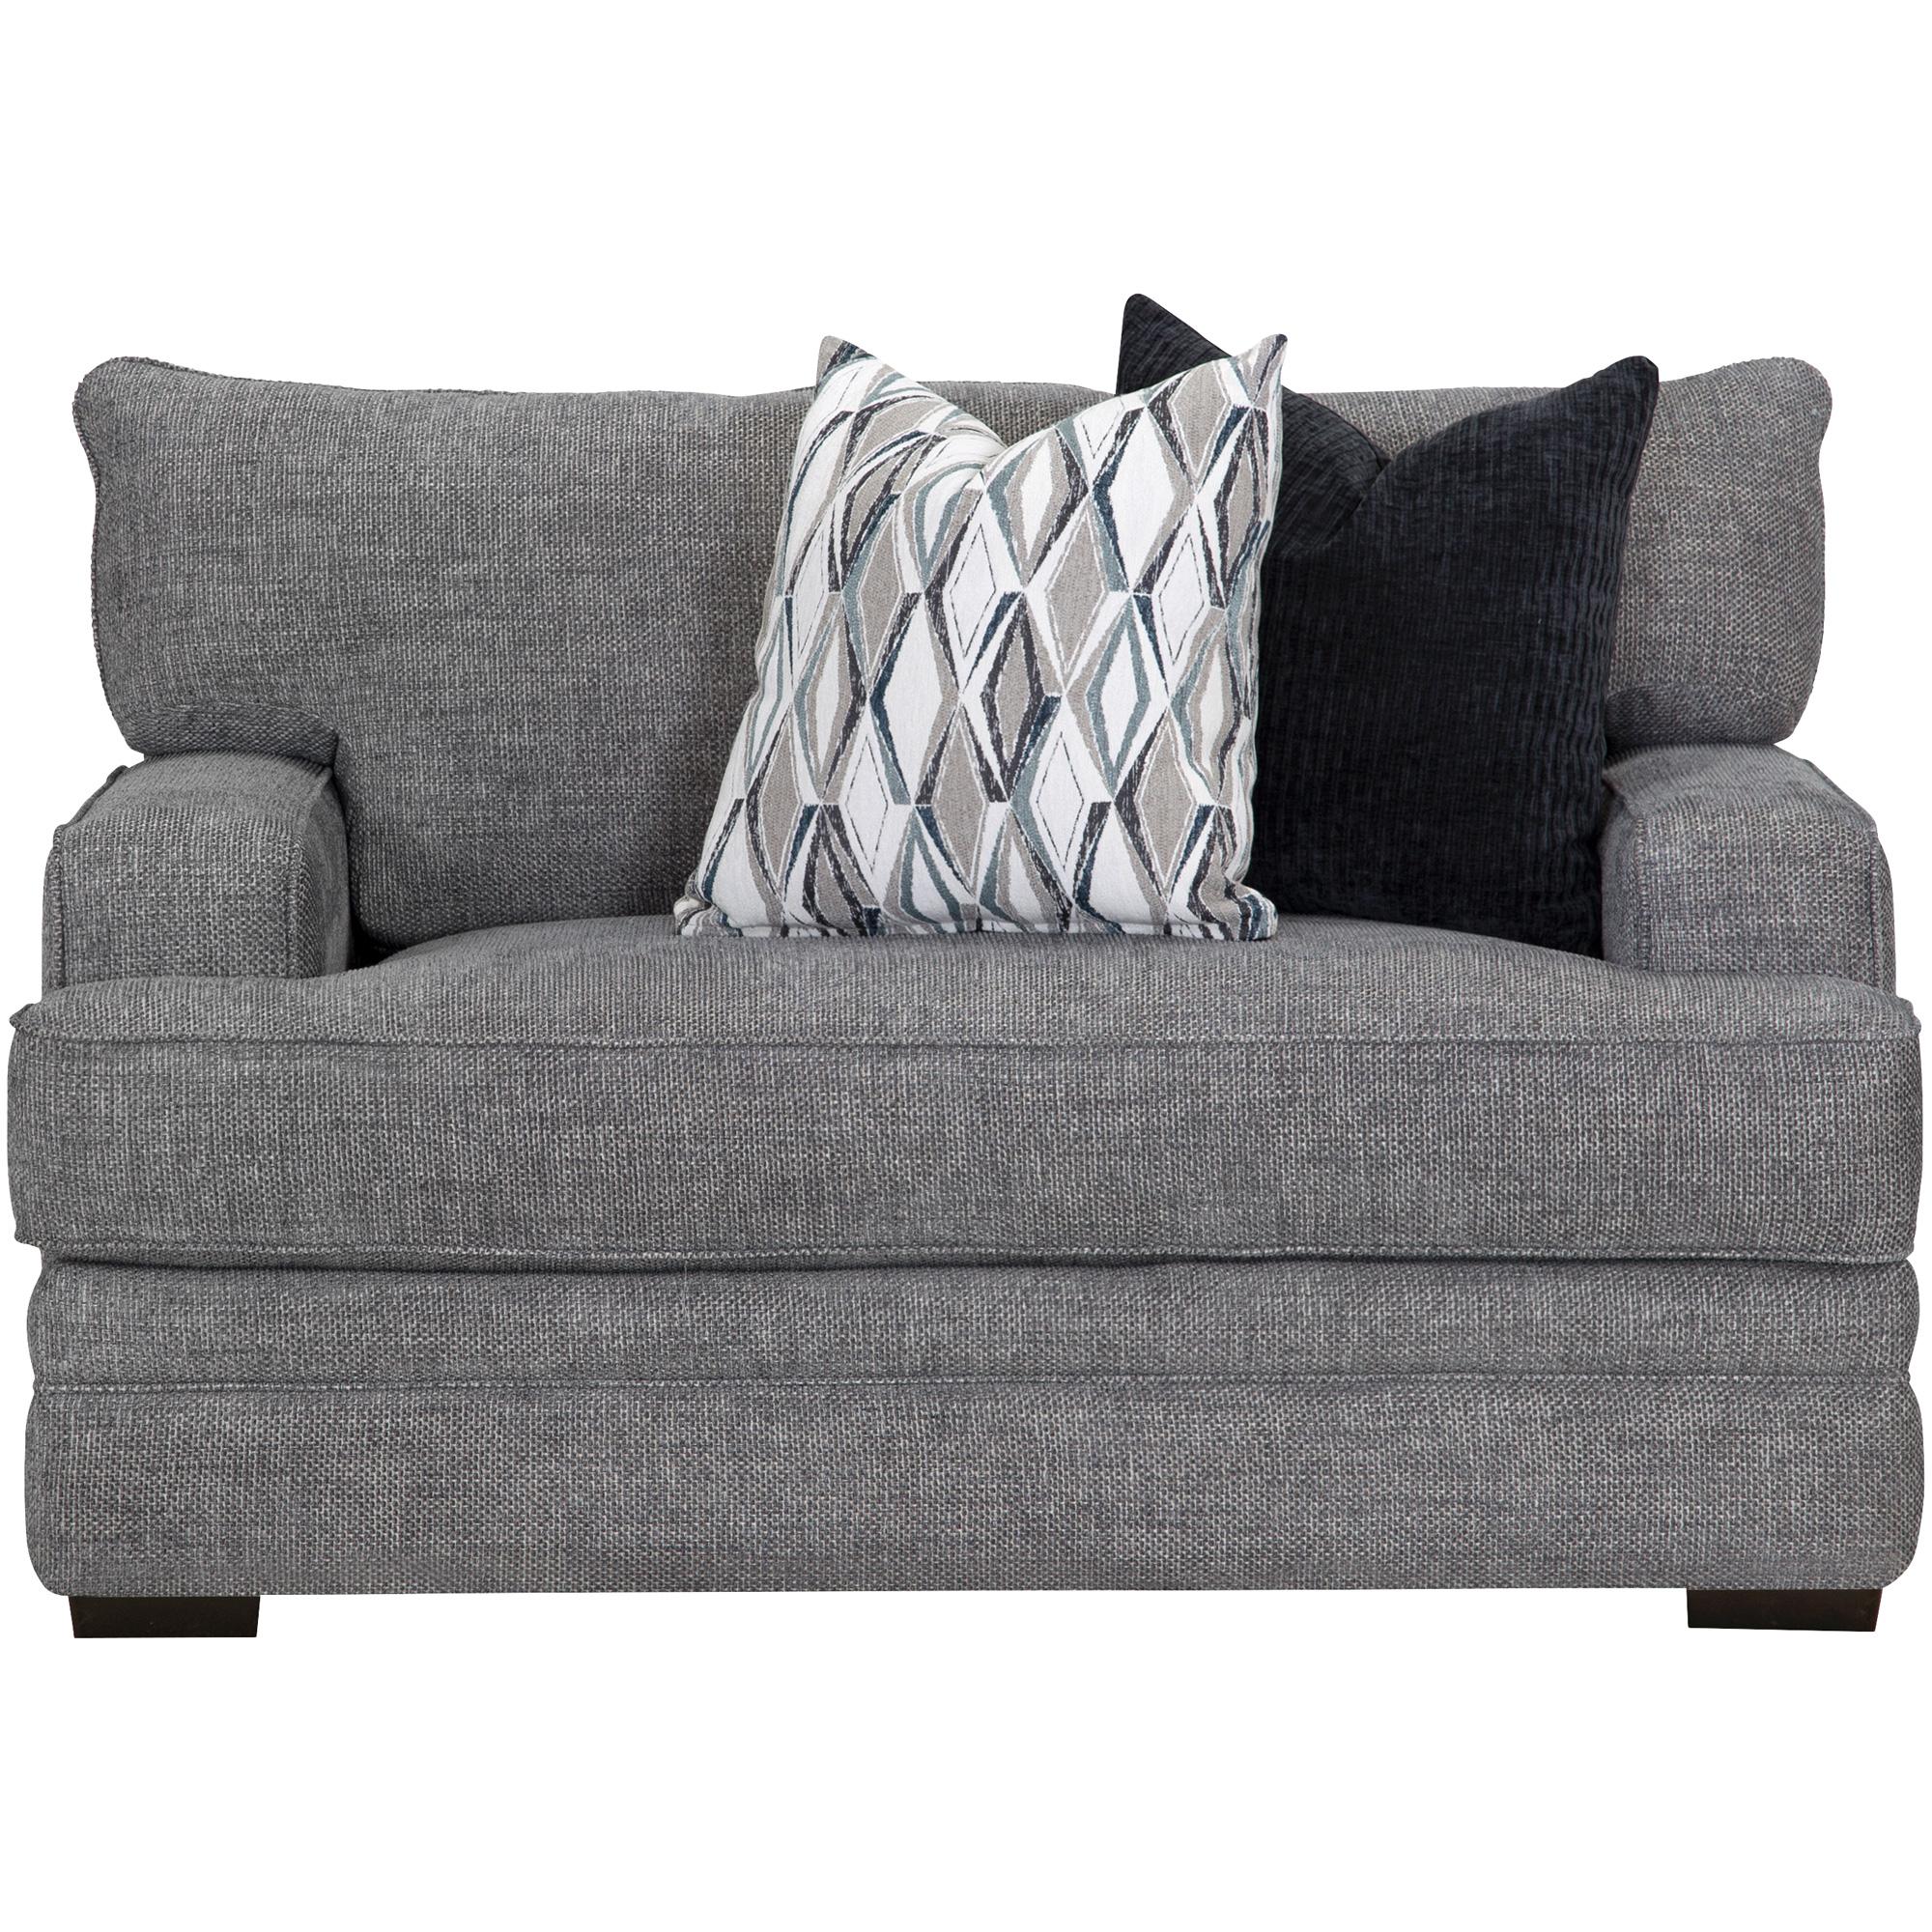 Franklin | Crowes Denim Chair